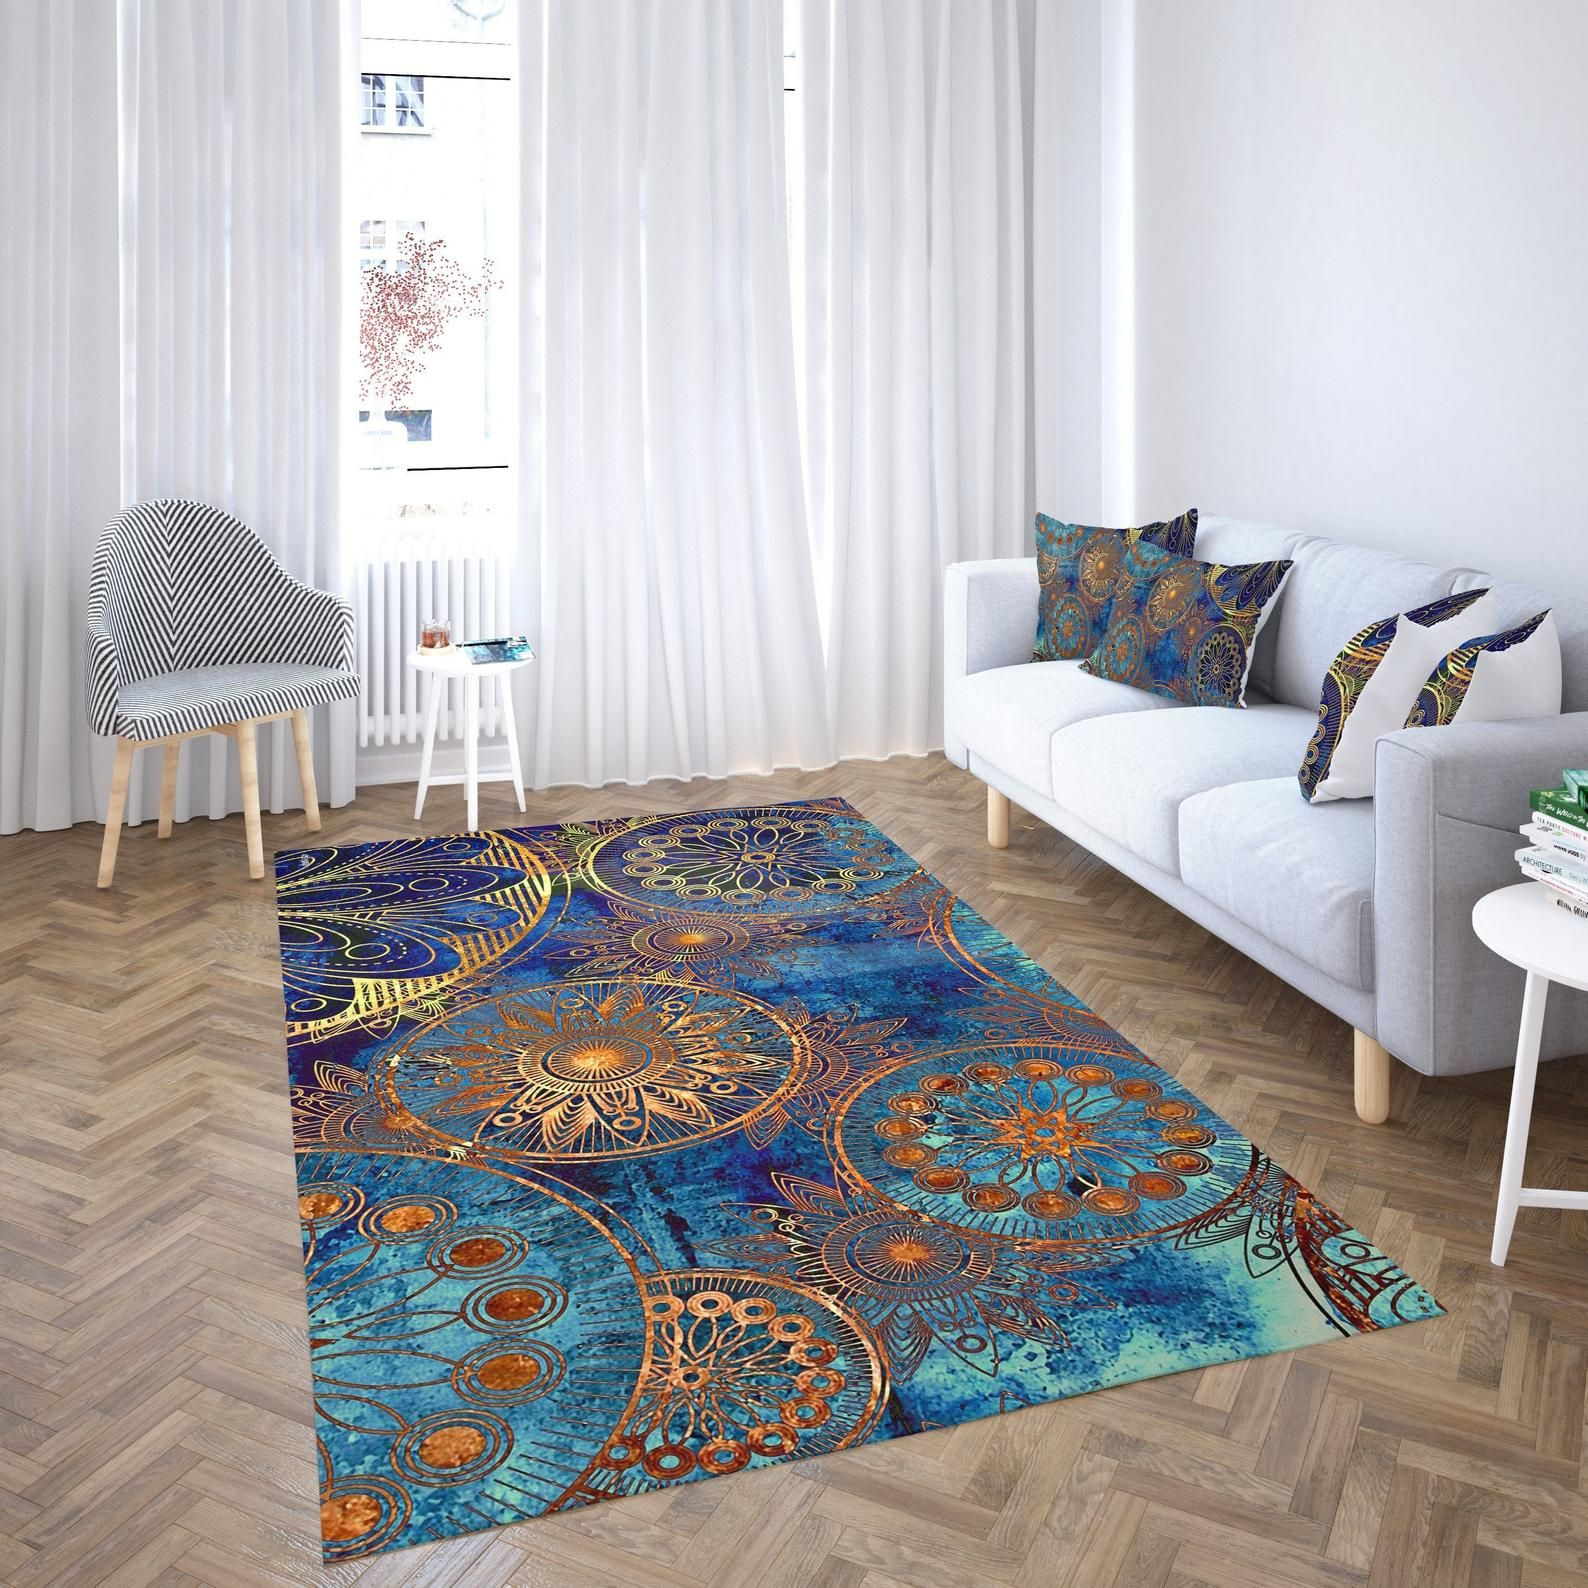 Custom room carpet make your own carpet doormat nonslip